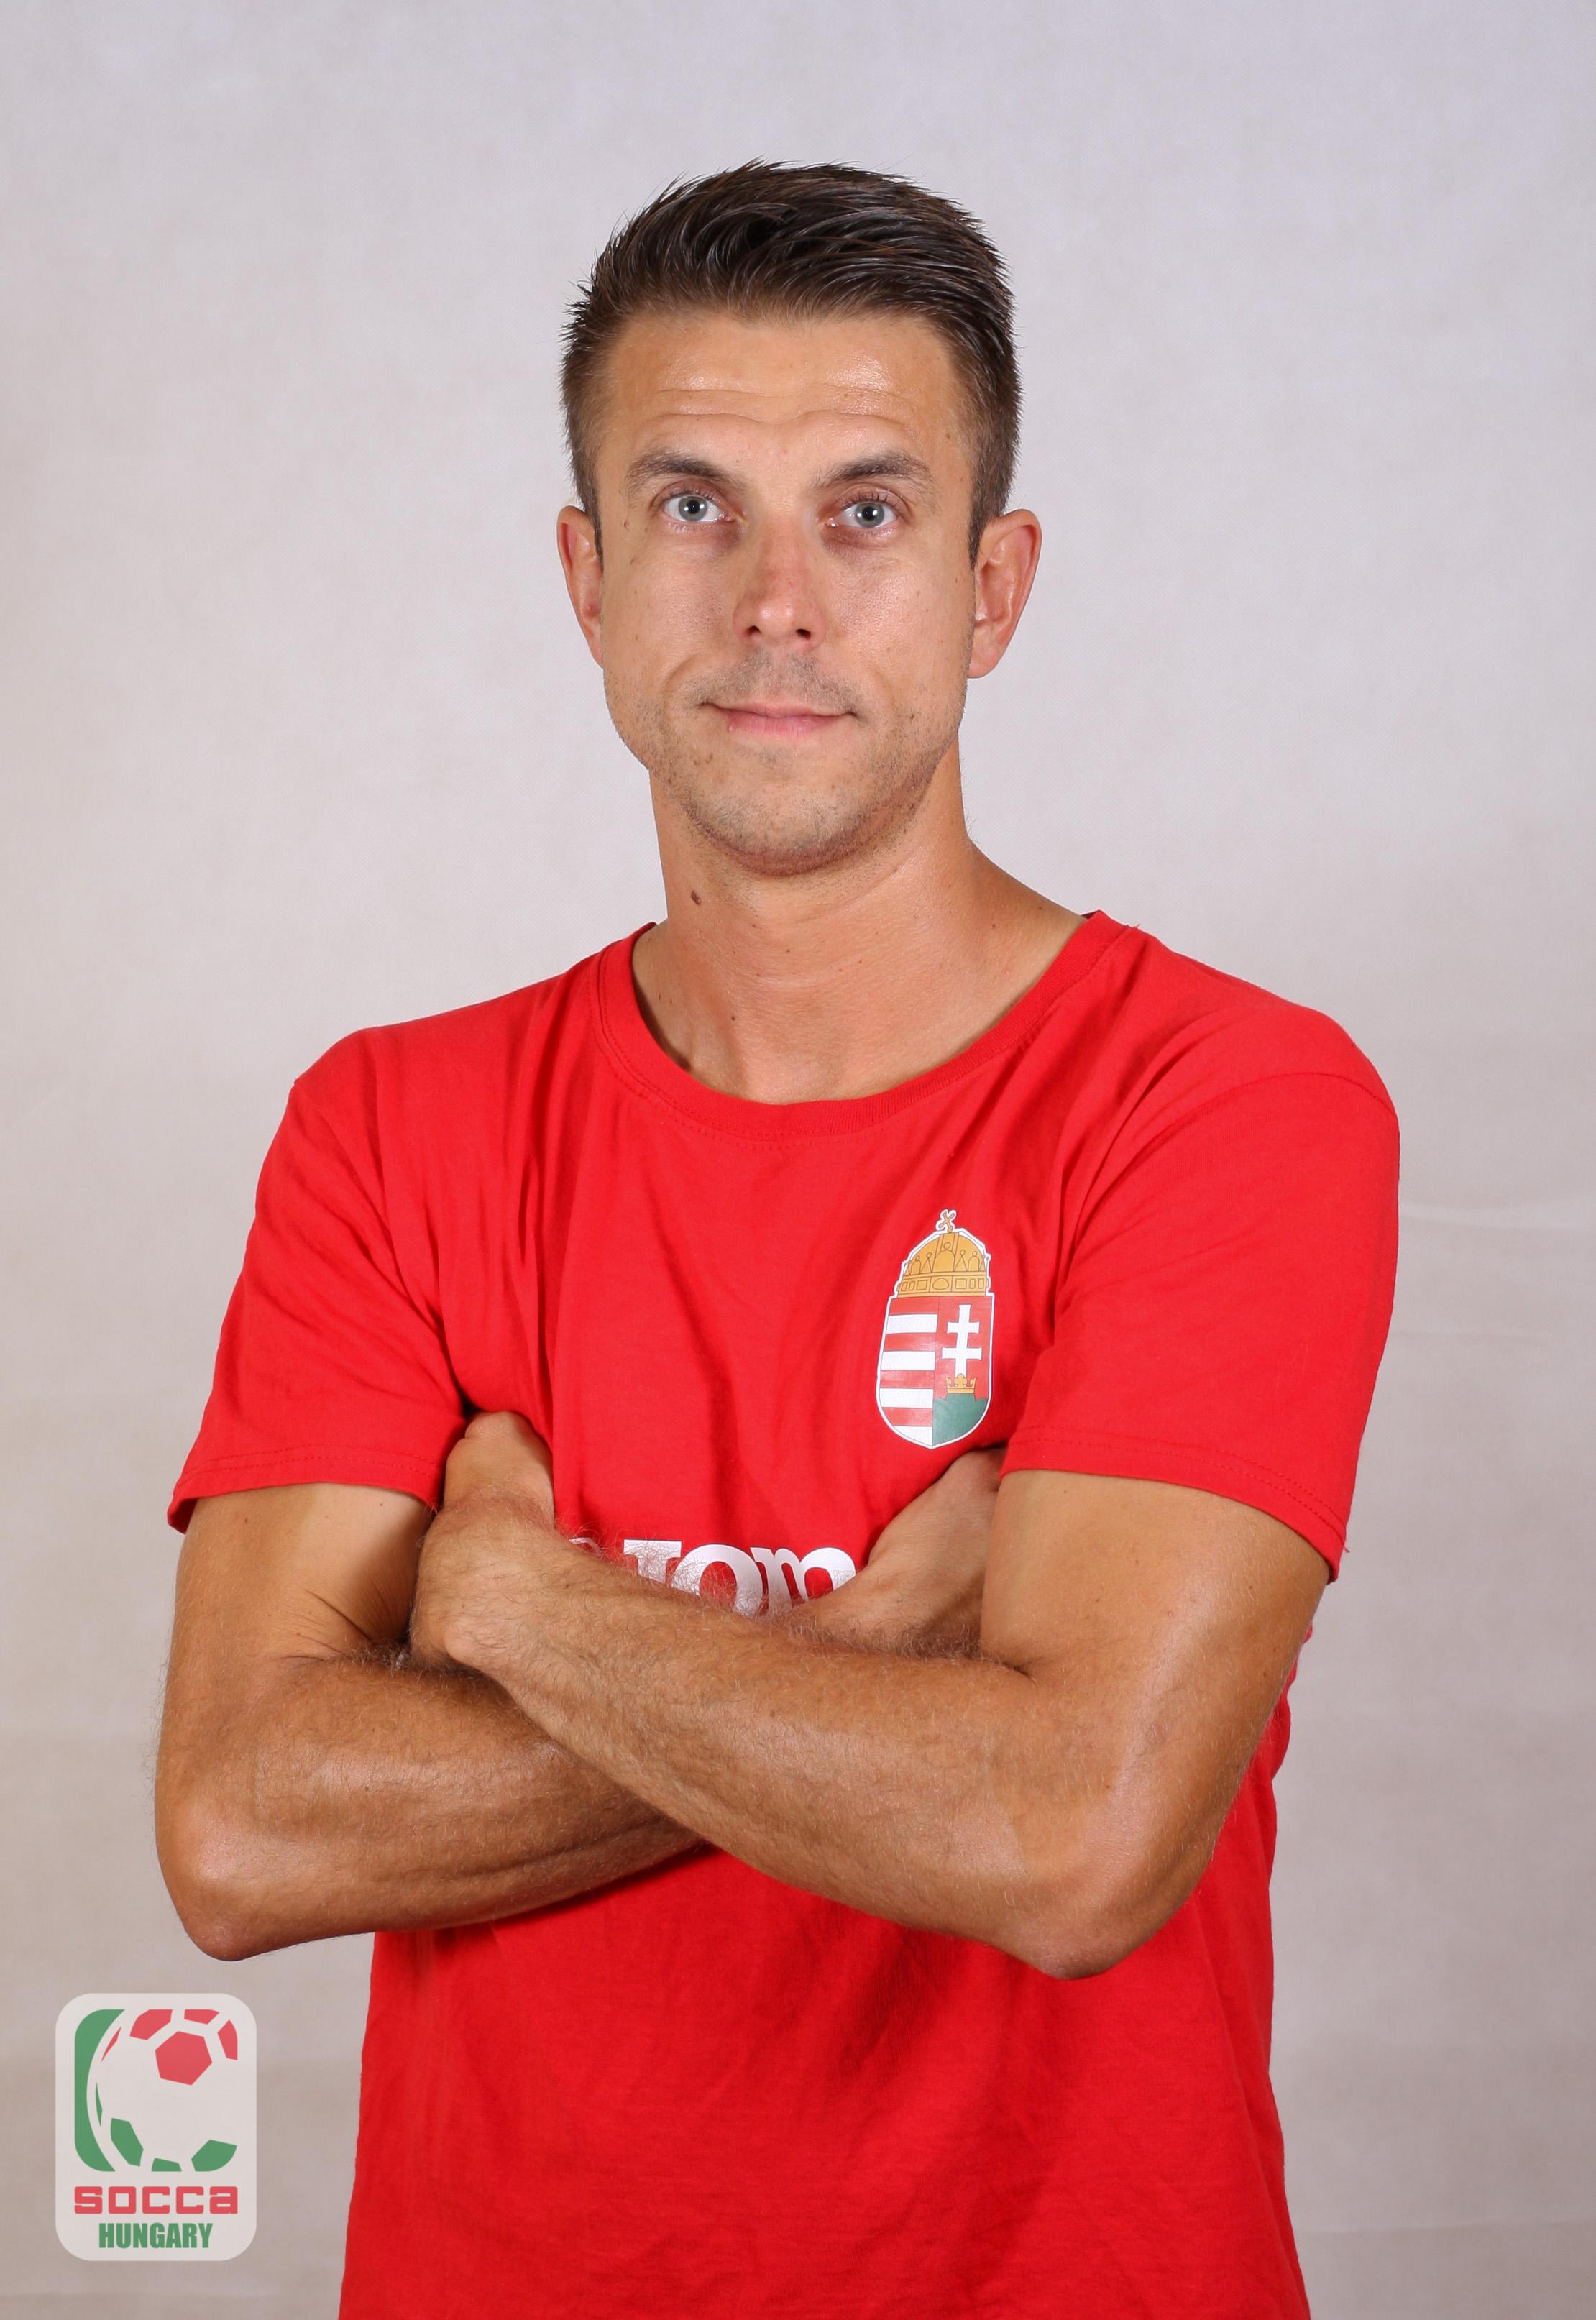 Zoltán Sámson